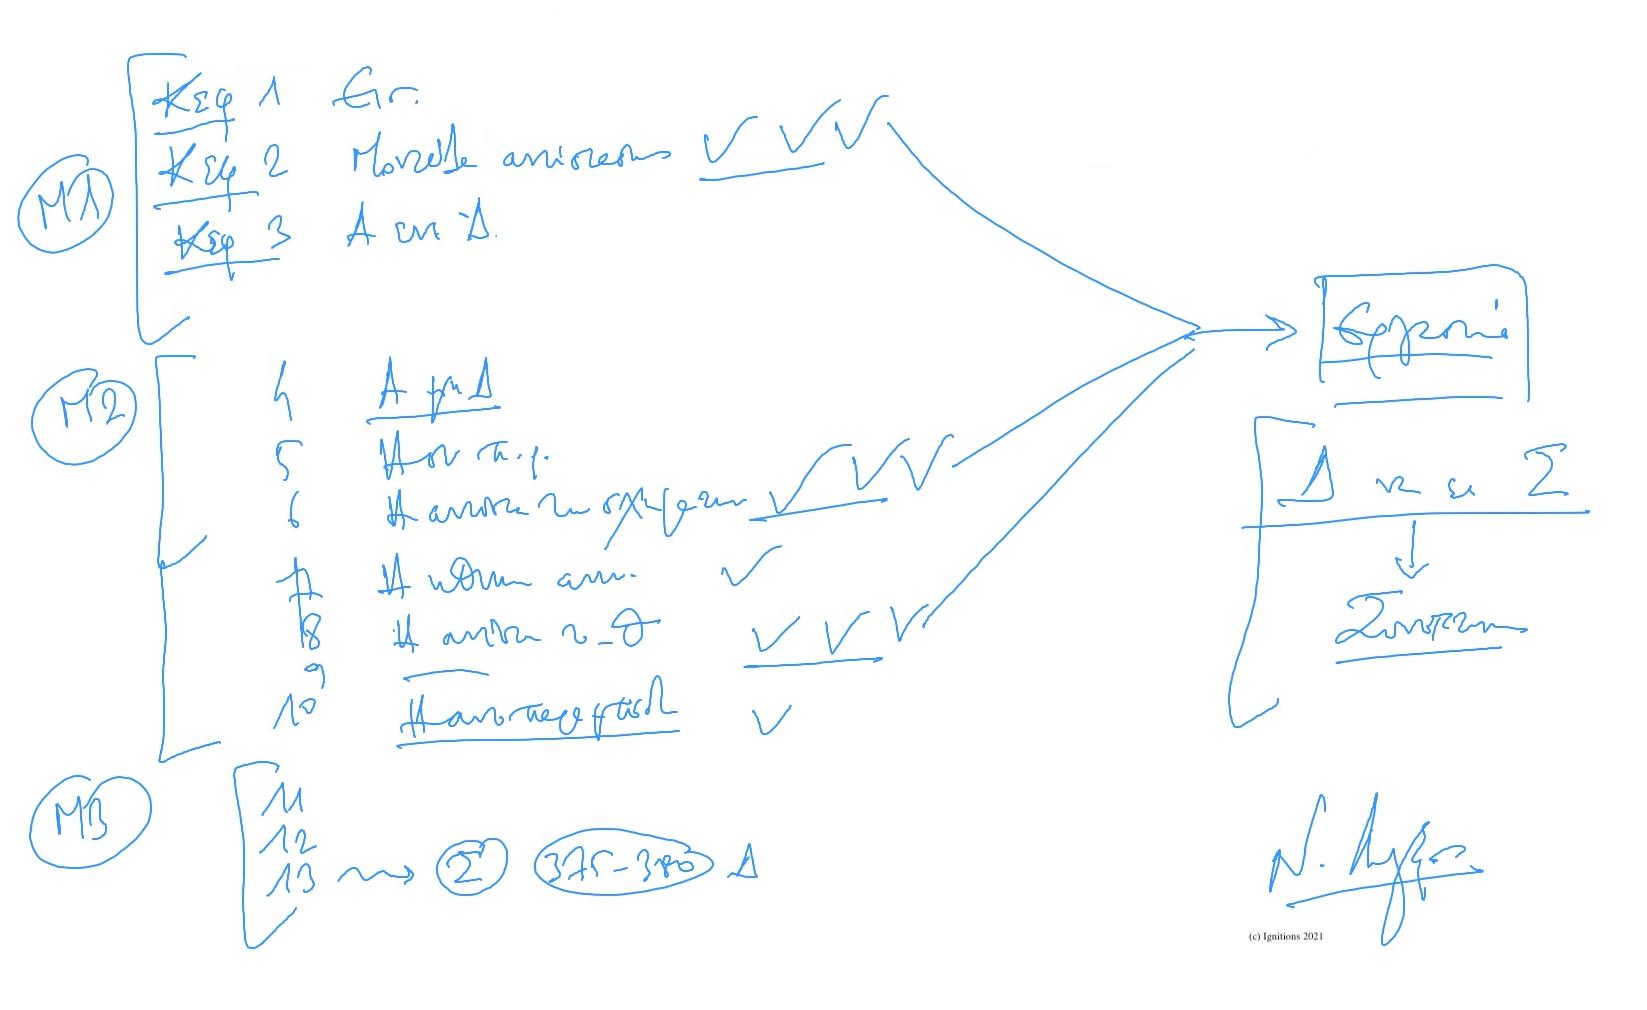 65308 - e-Μάθημα II: Επίλυση Μεθοδολογικών Προβλημάτων. (Dessin)